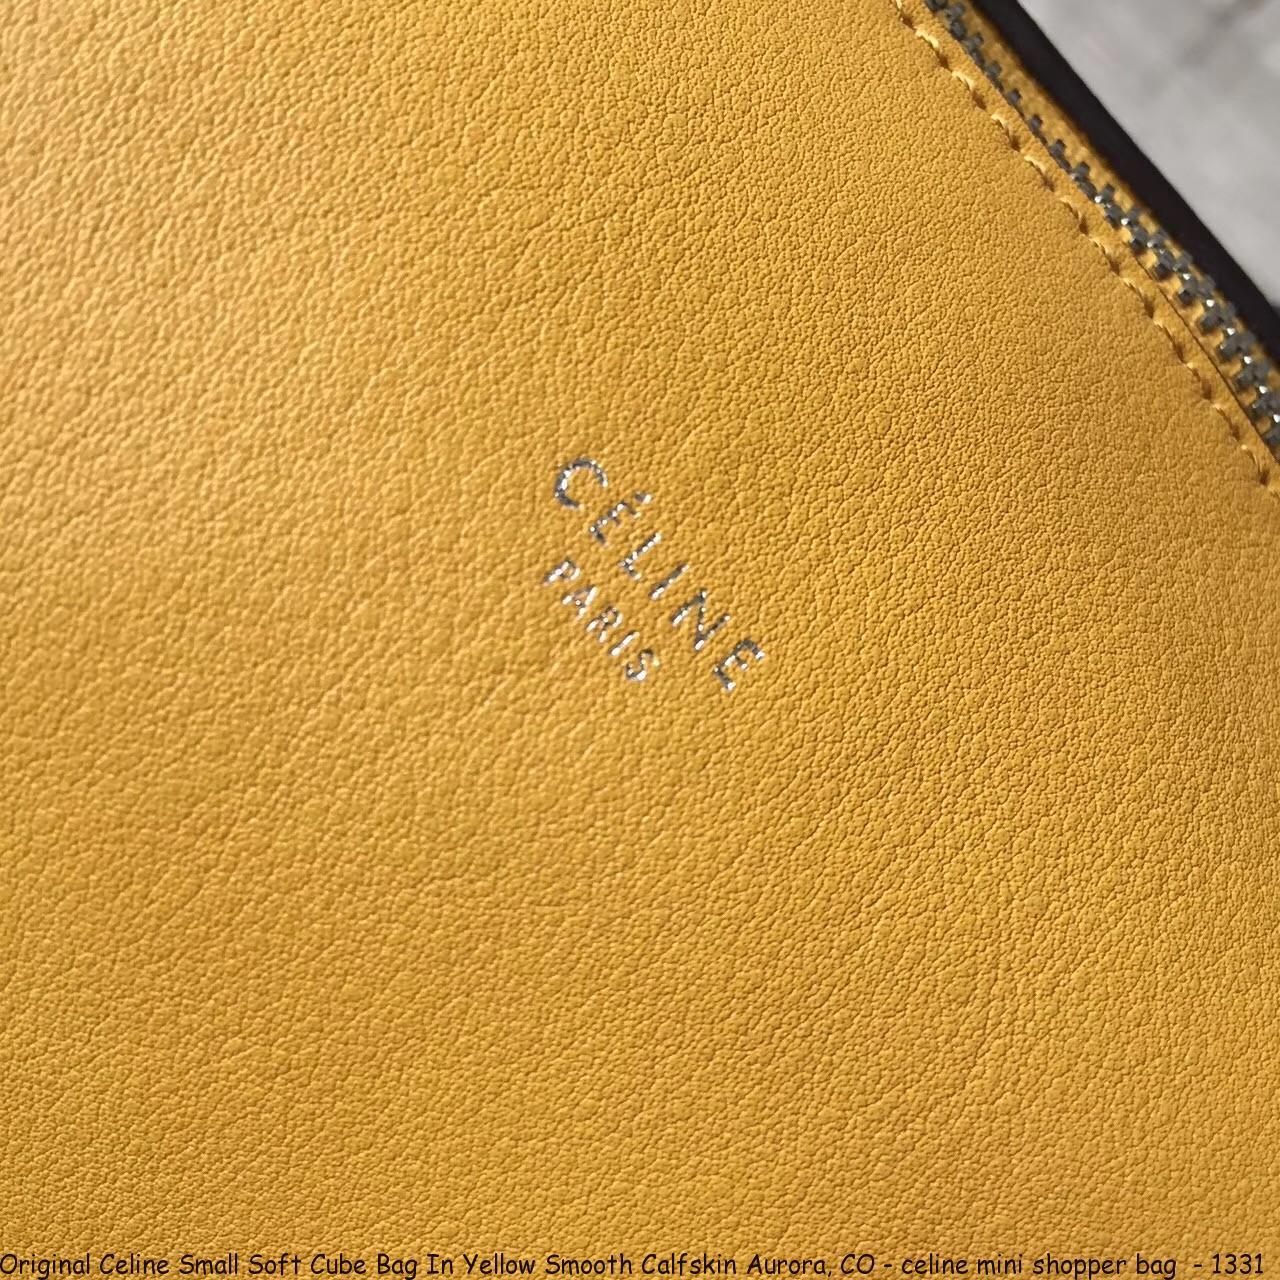 8477e9849f86 Original Celine Small Soft Cube Bag In Yellow Smooth Calfskin Aurora ...